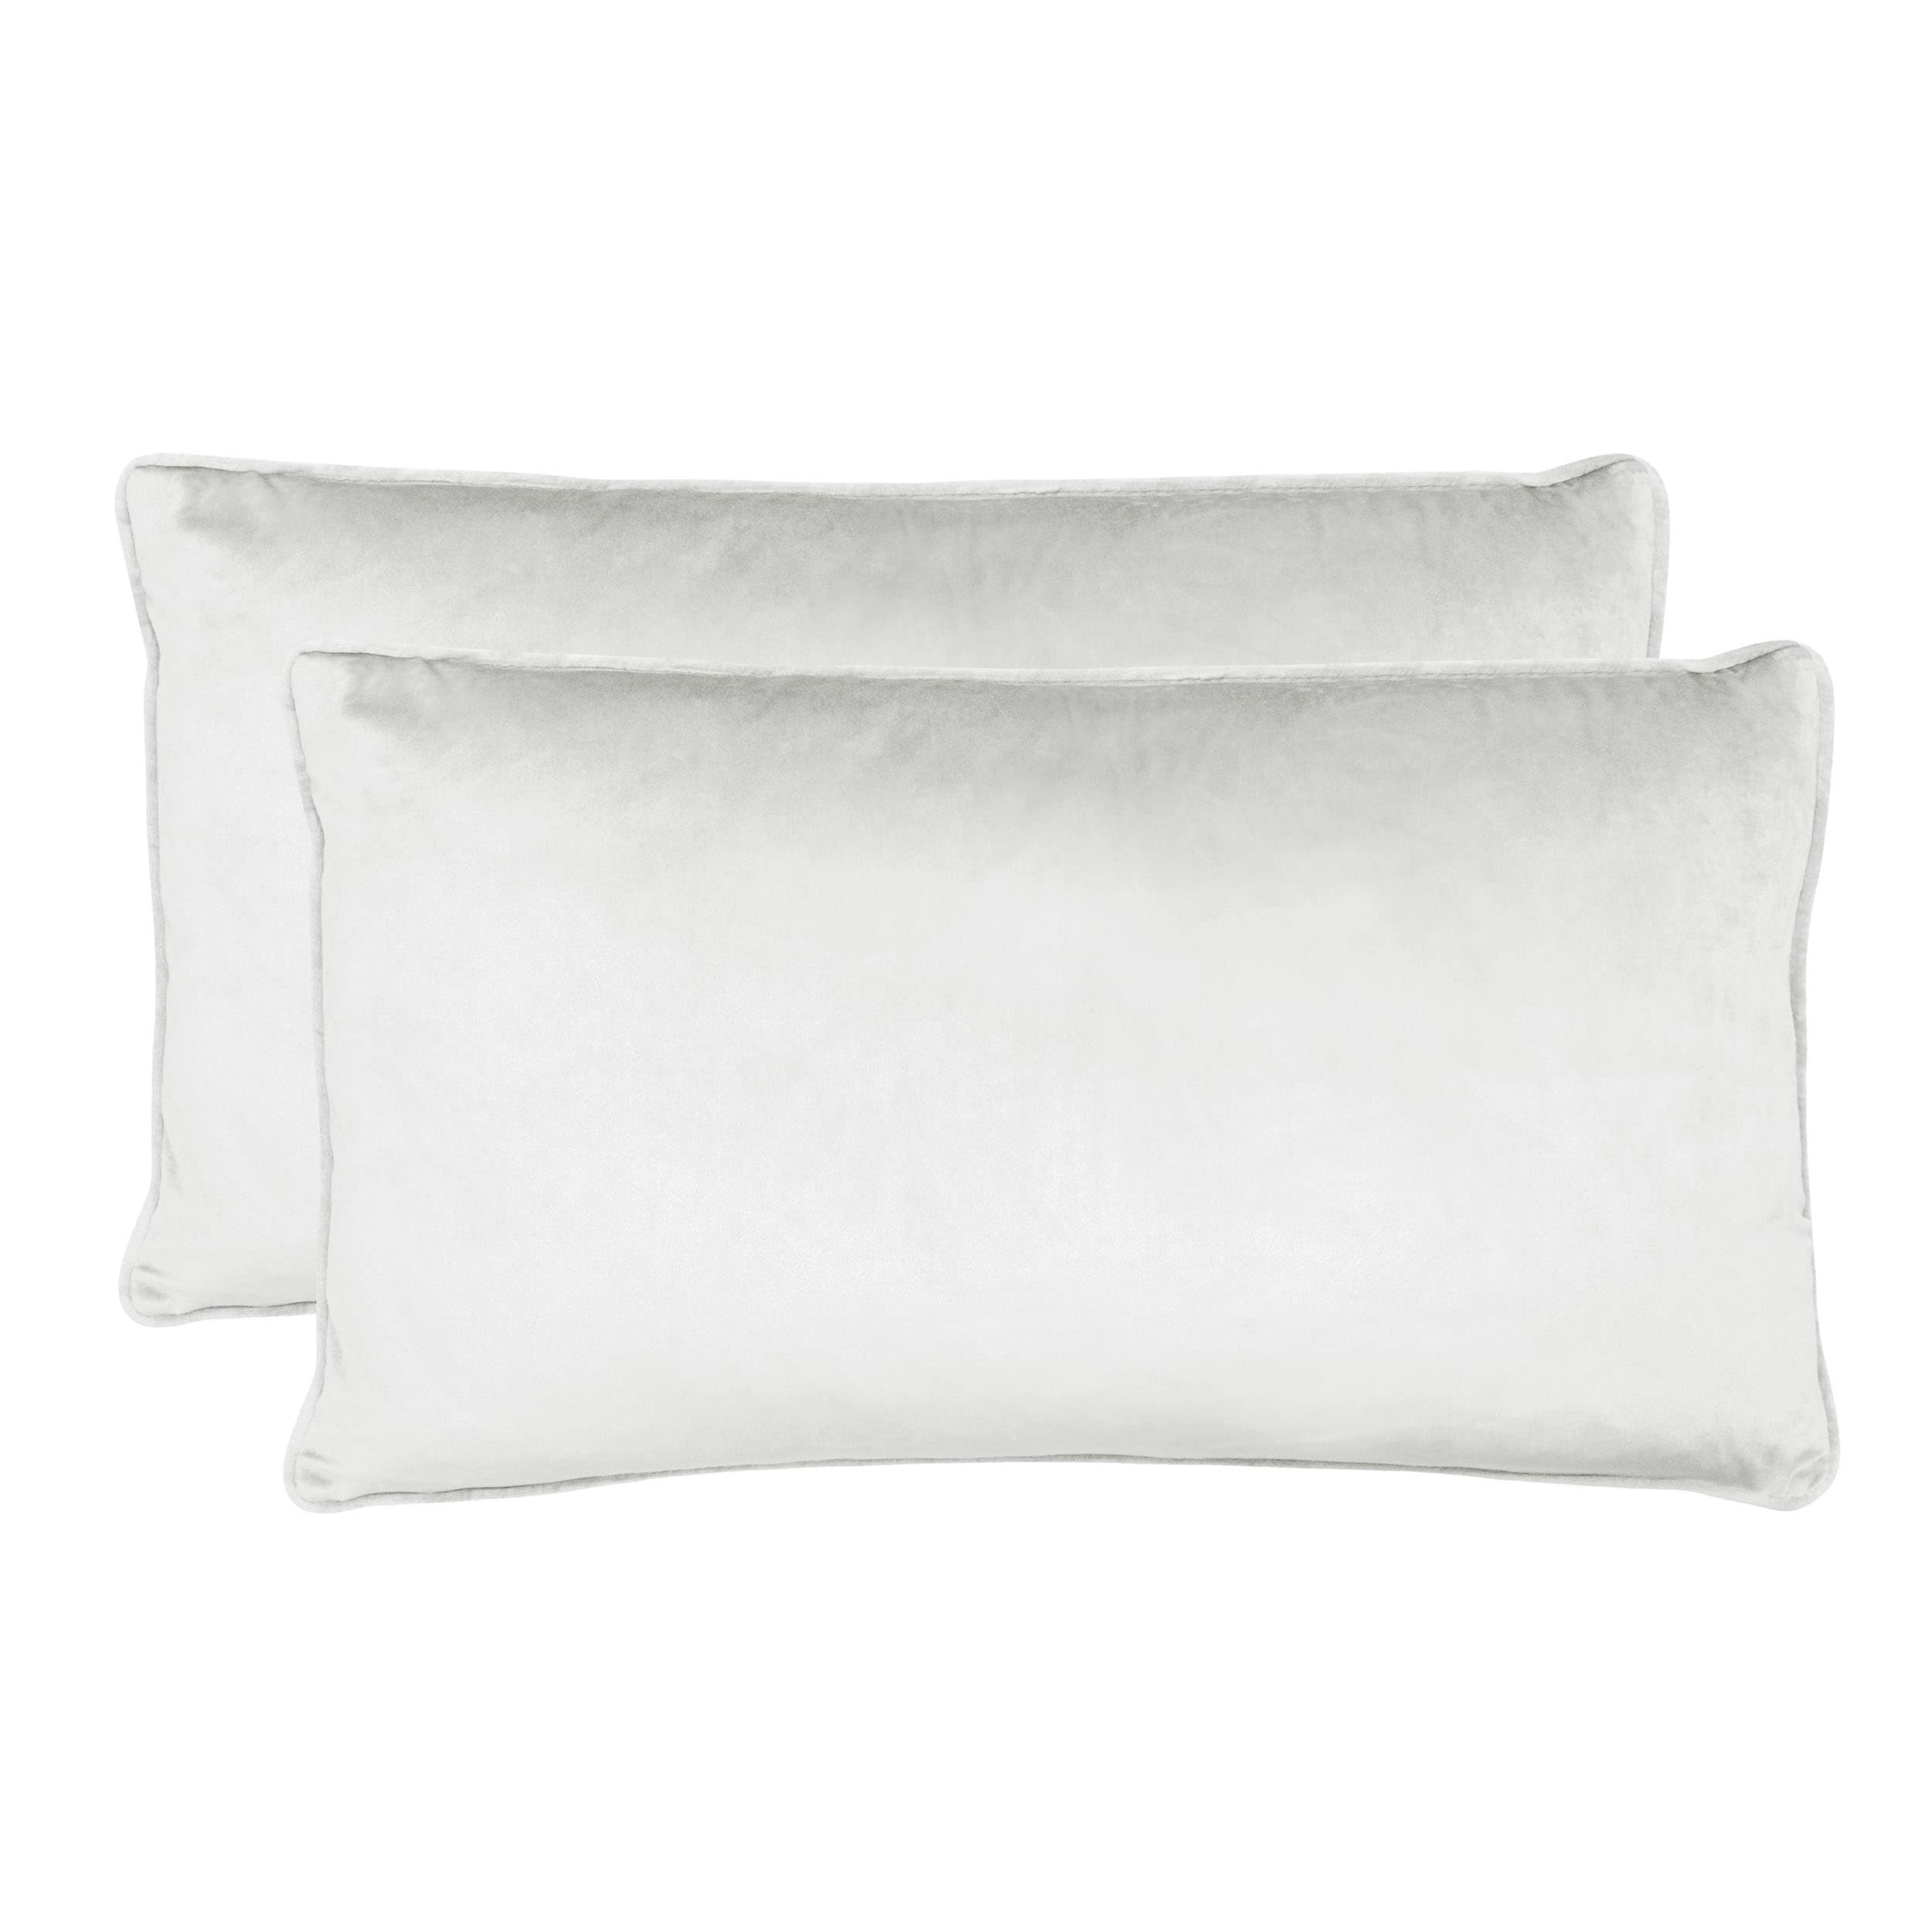 Buy Grey Throw Pillows Online at Overstockcom